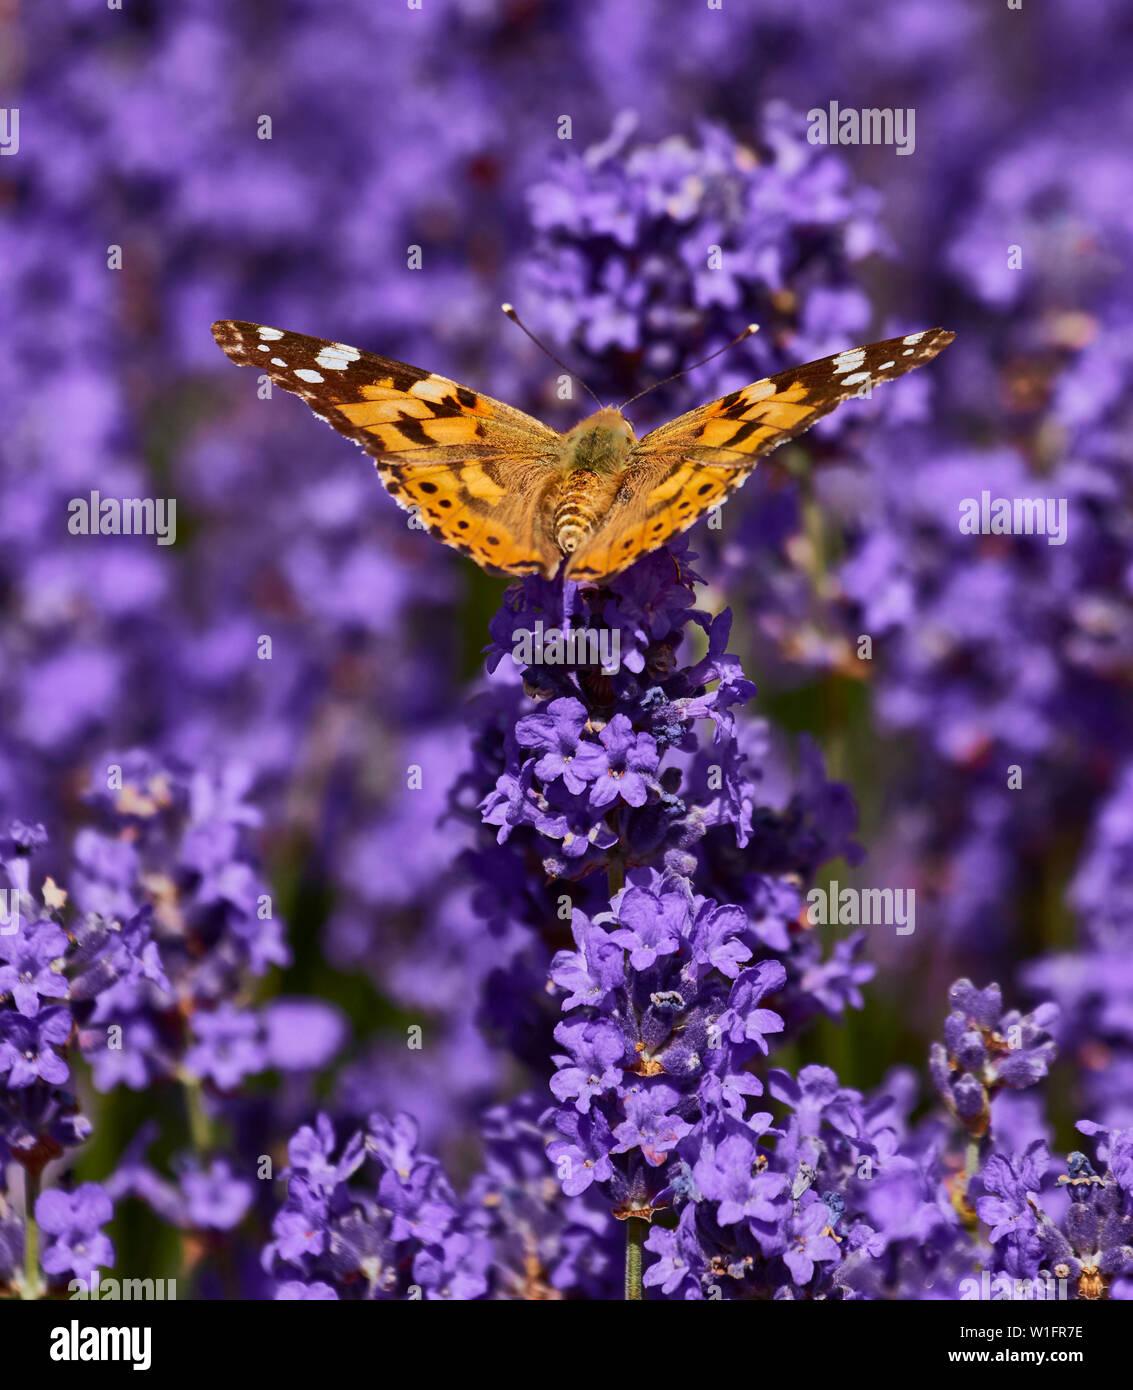 Butterfly feeding on radiant lavender plants in an urban garden - Stock Image